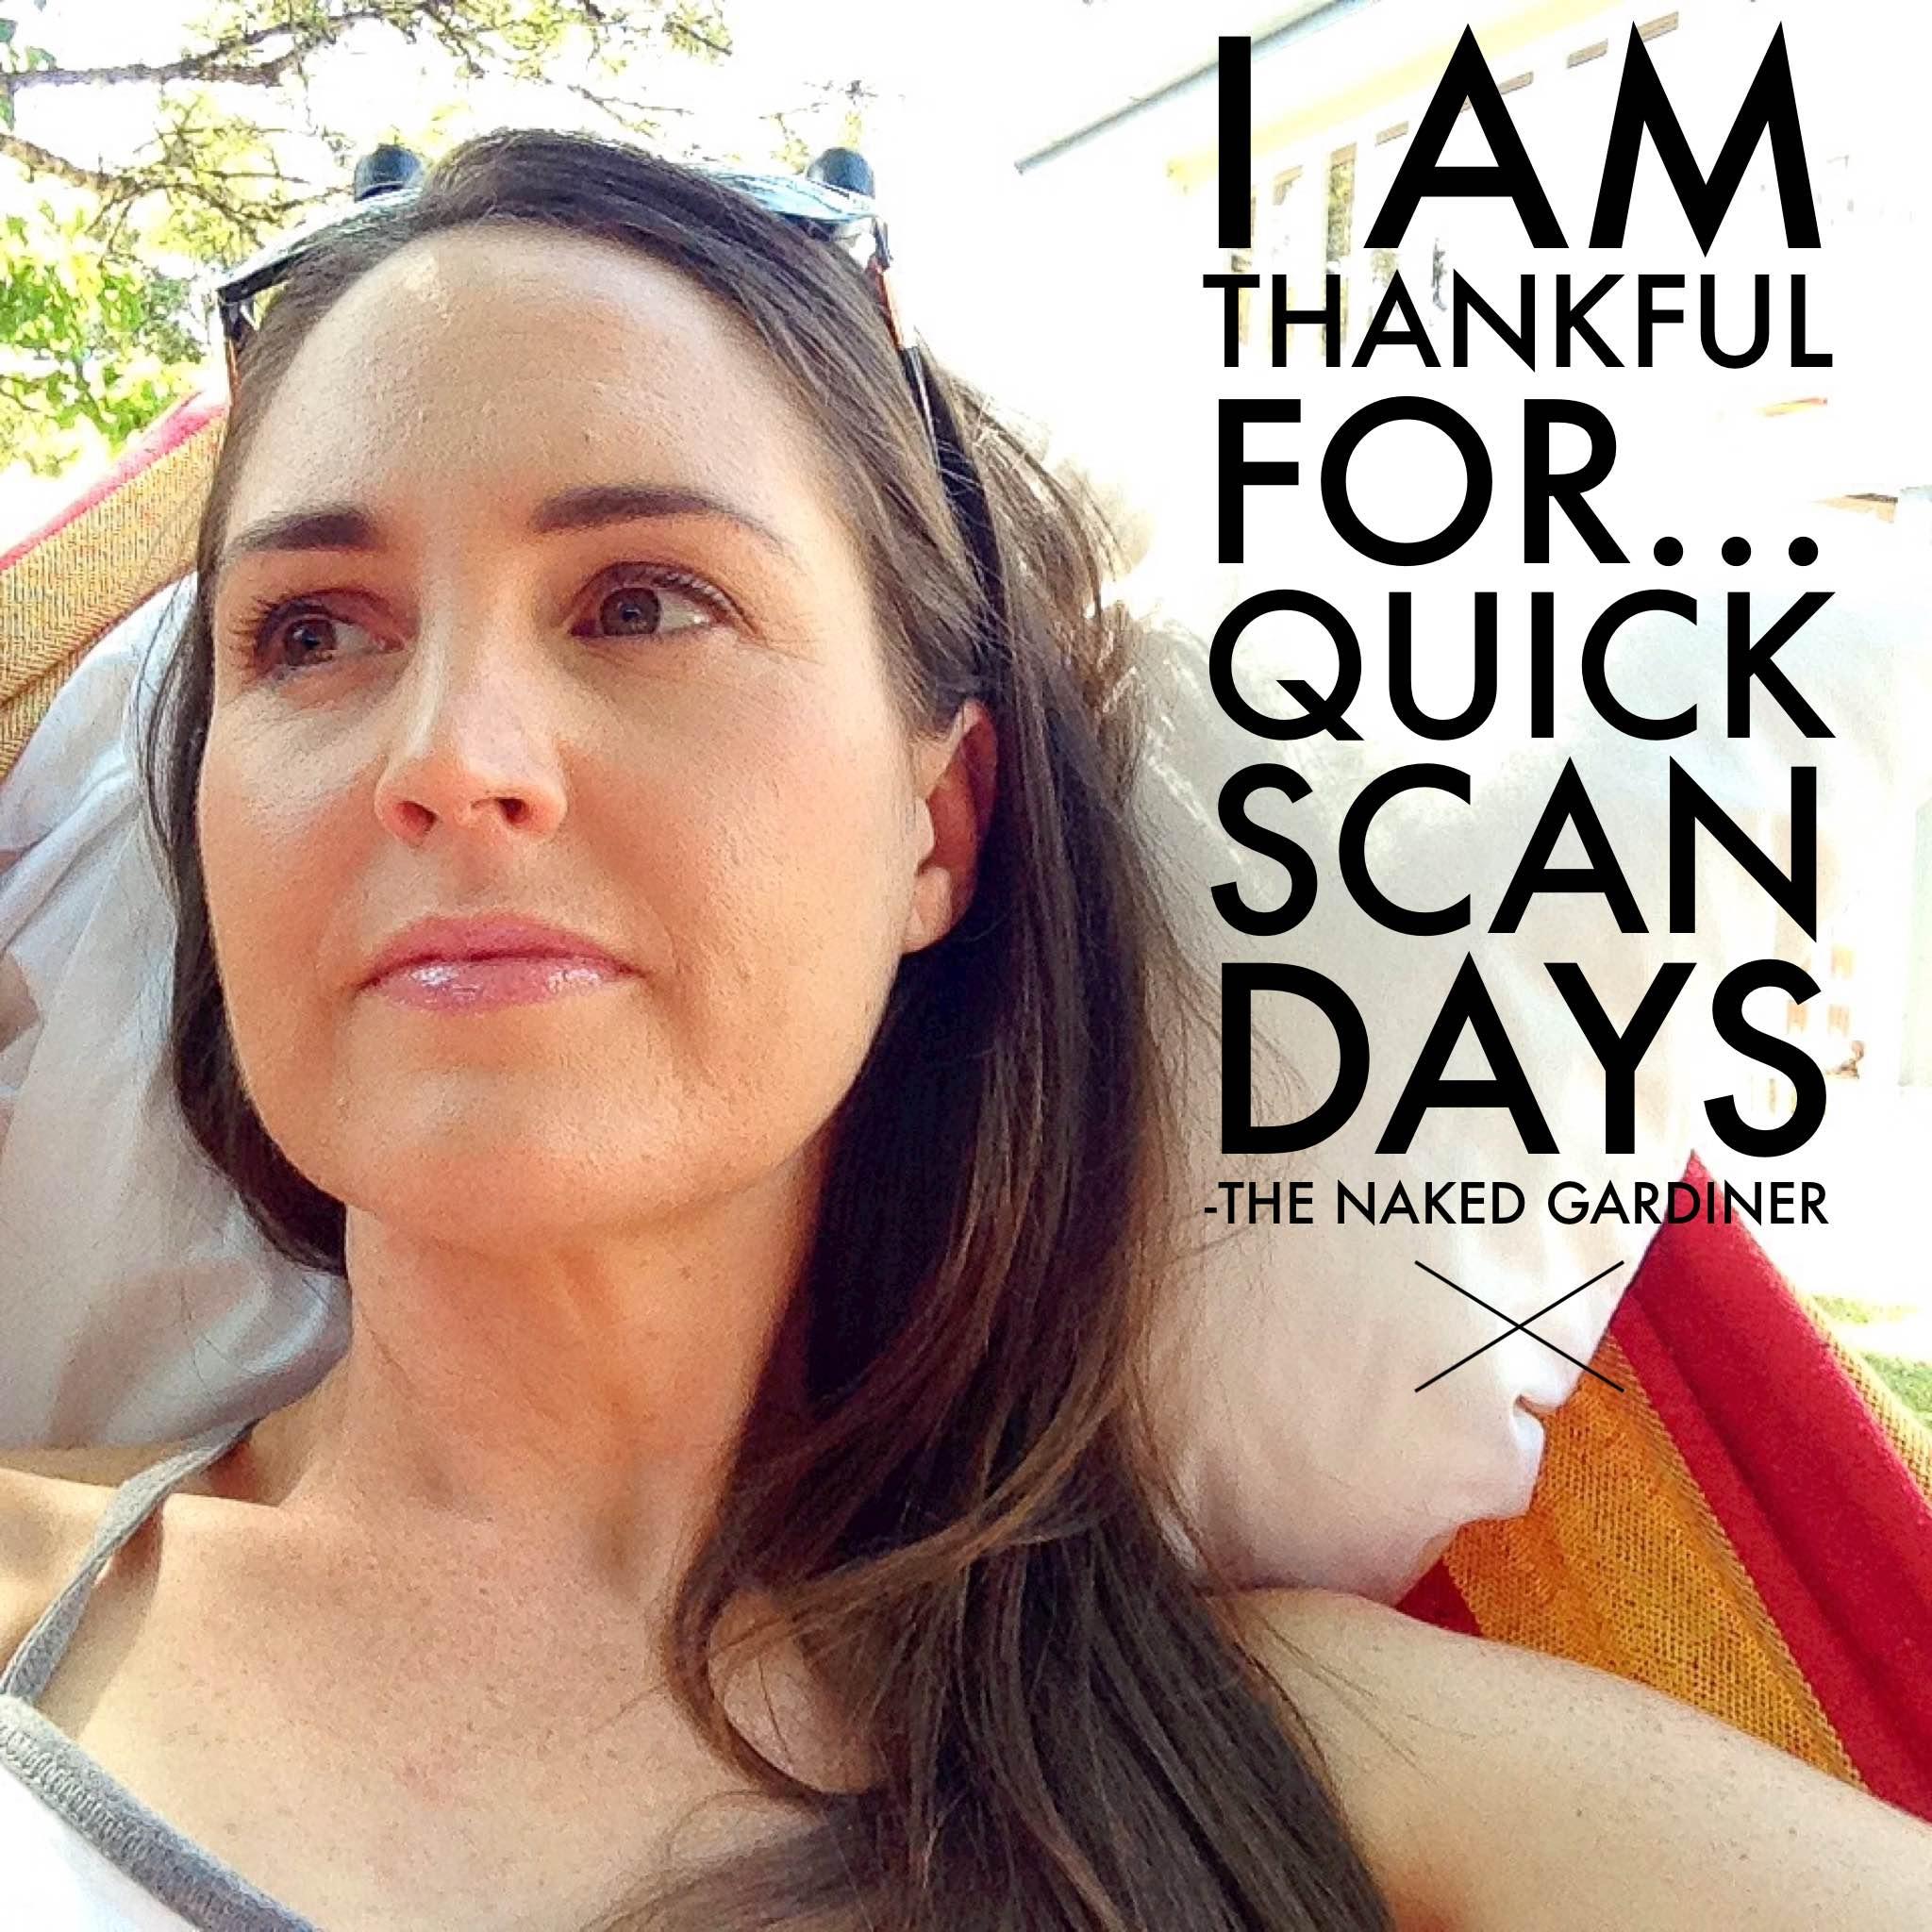 thankful-thursdays-quick-scan-days-thenakedgardiner